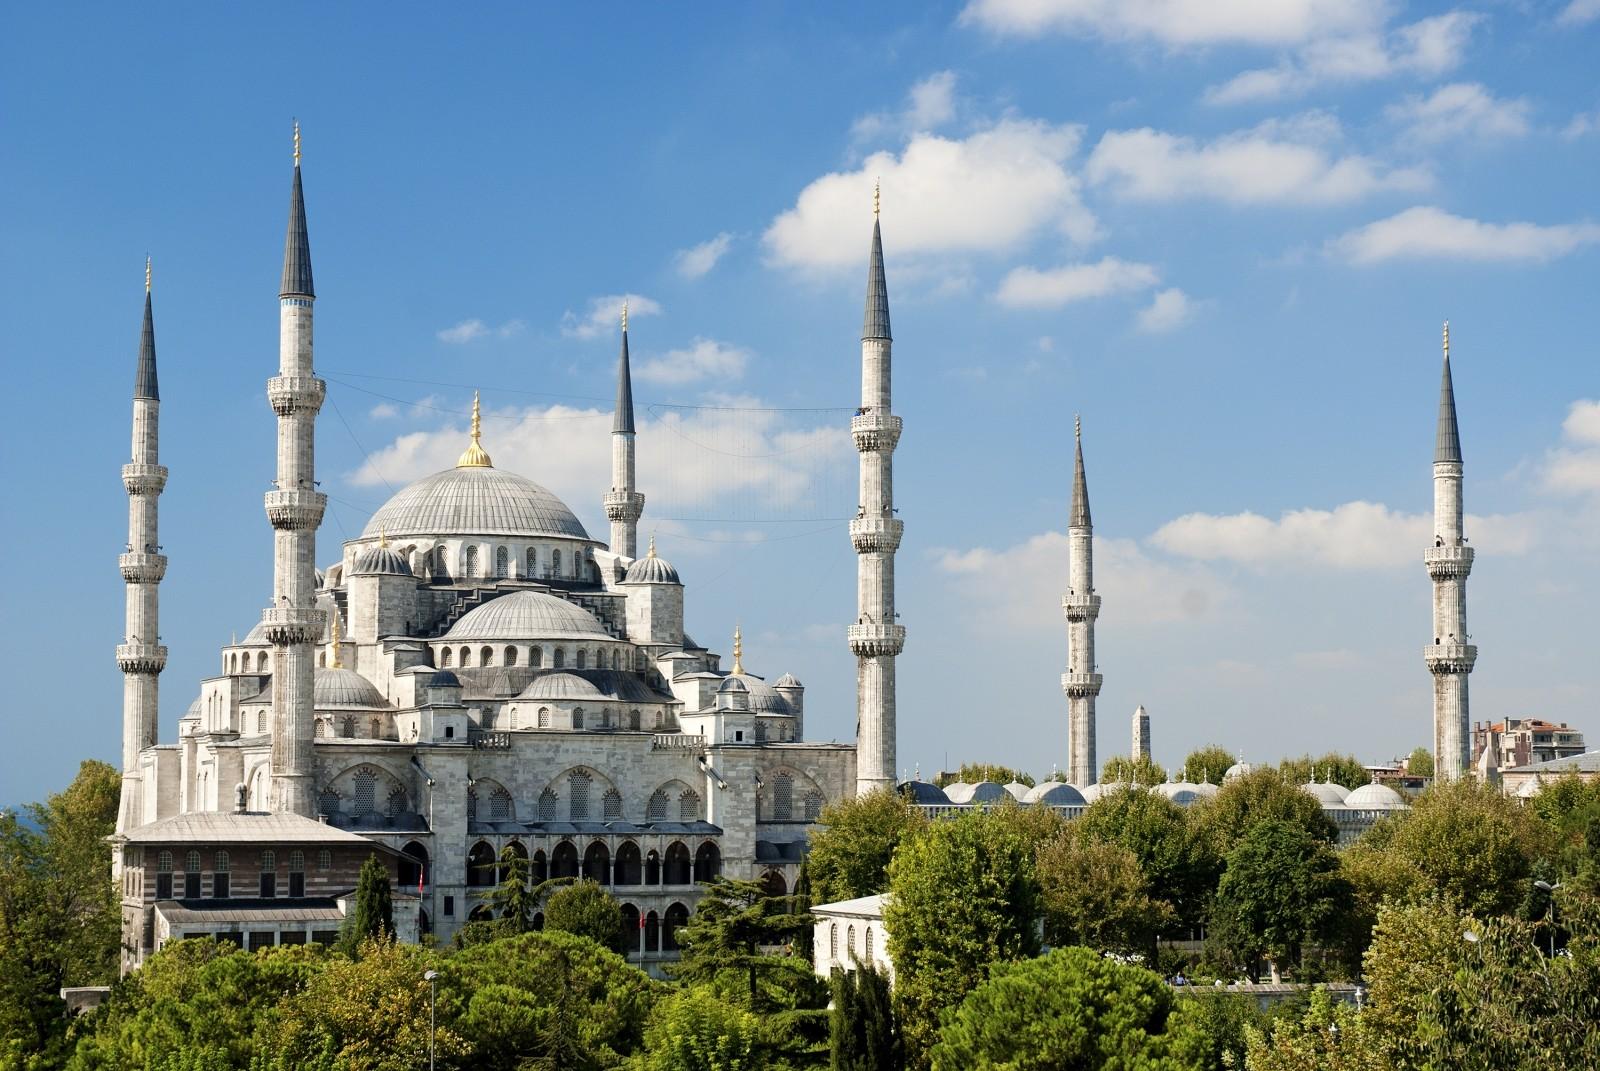 TESOL Turkey - Cultural Sensitivity in the ESL Classroom